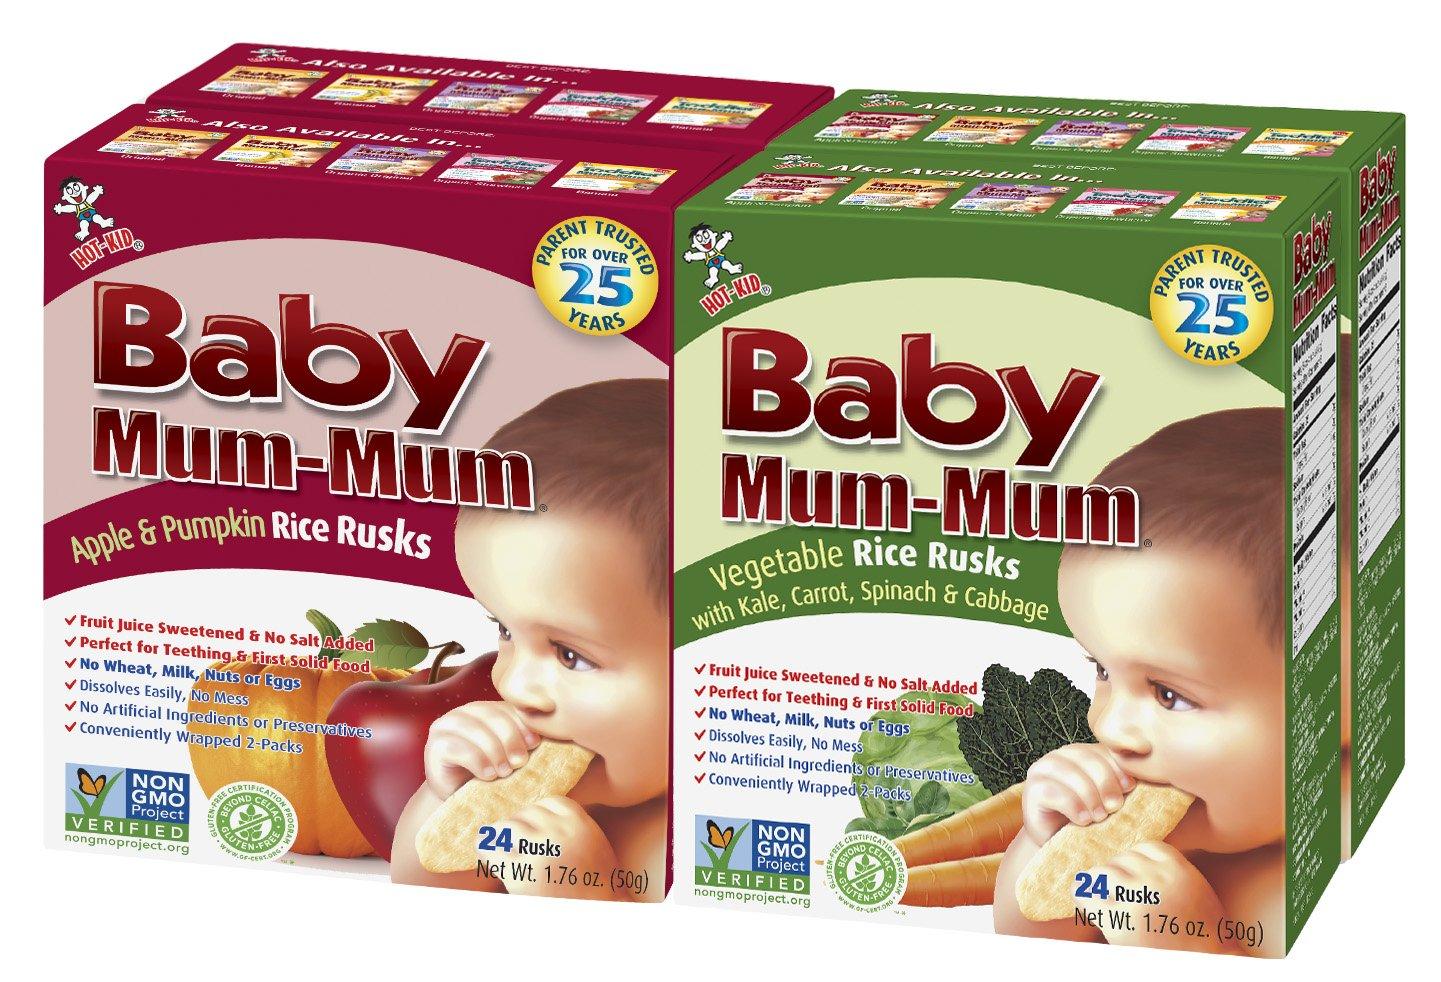 Hot-Kid Baby Mum-Mum Rice Rusks, 2 Flavor Variety Pack, Apple & Pumpkin/Vegetable, 4 count (2 of each)